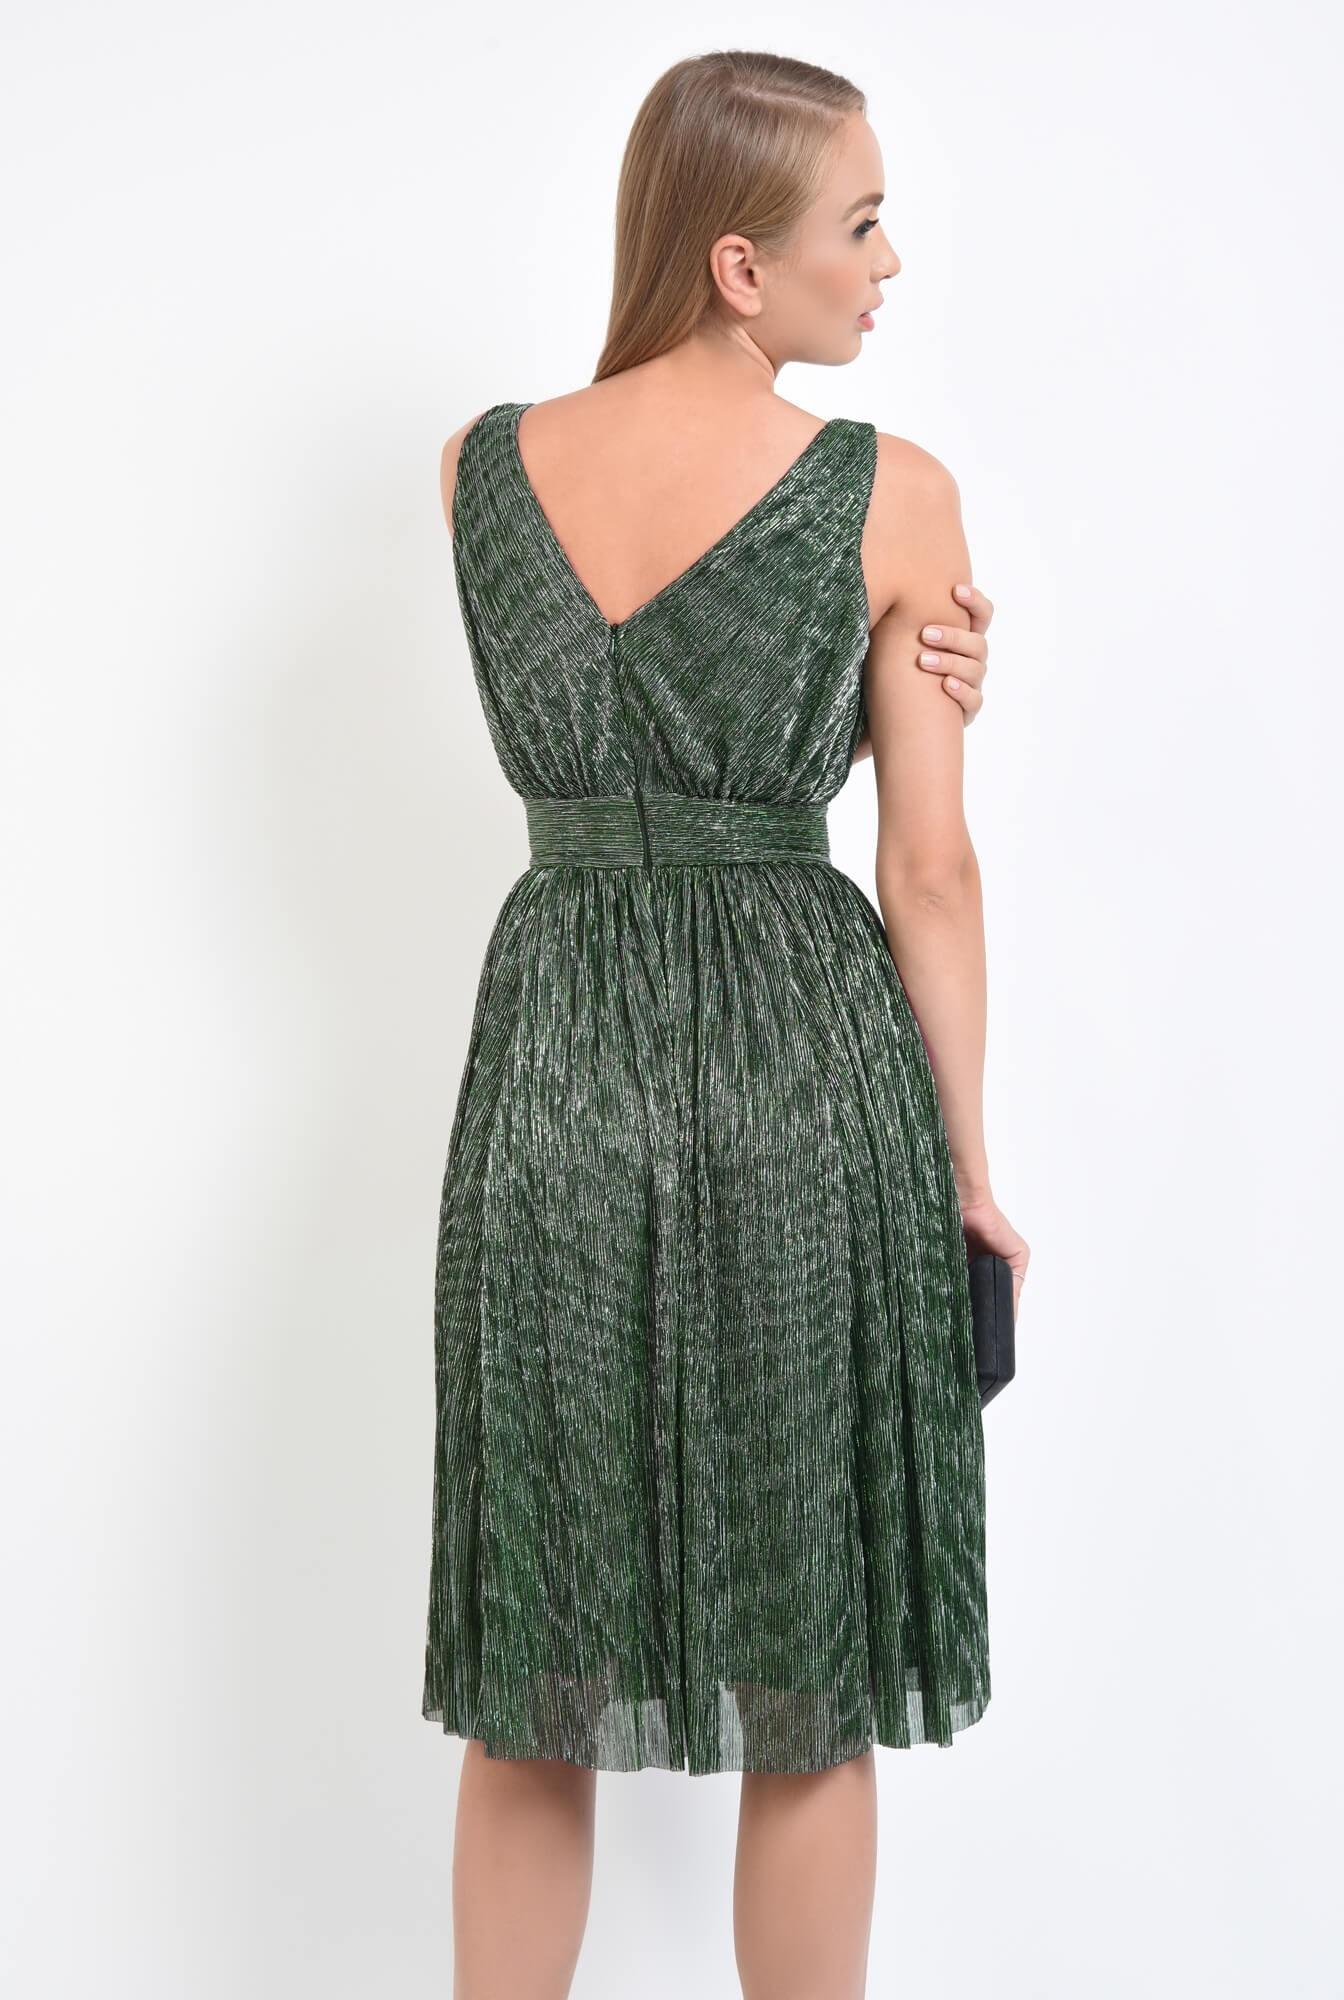 1 - rochie de seara, clos, betelie lata, decolteu anchior, verde